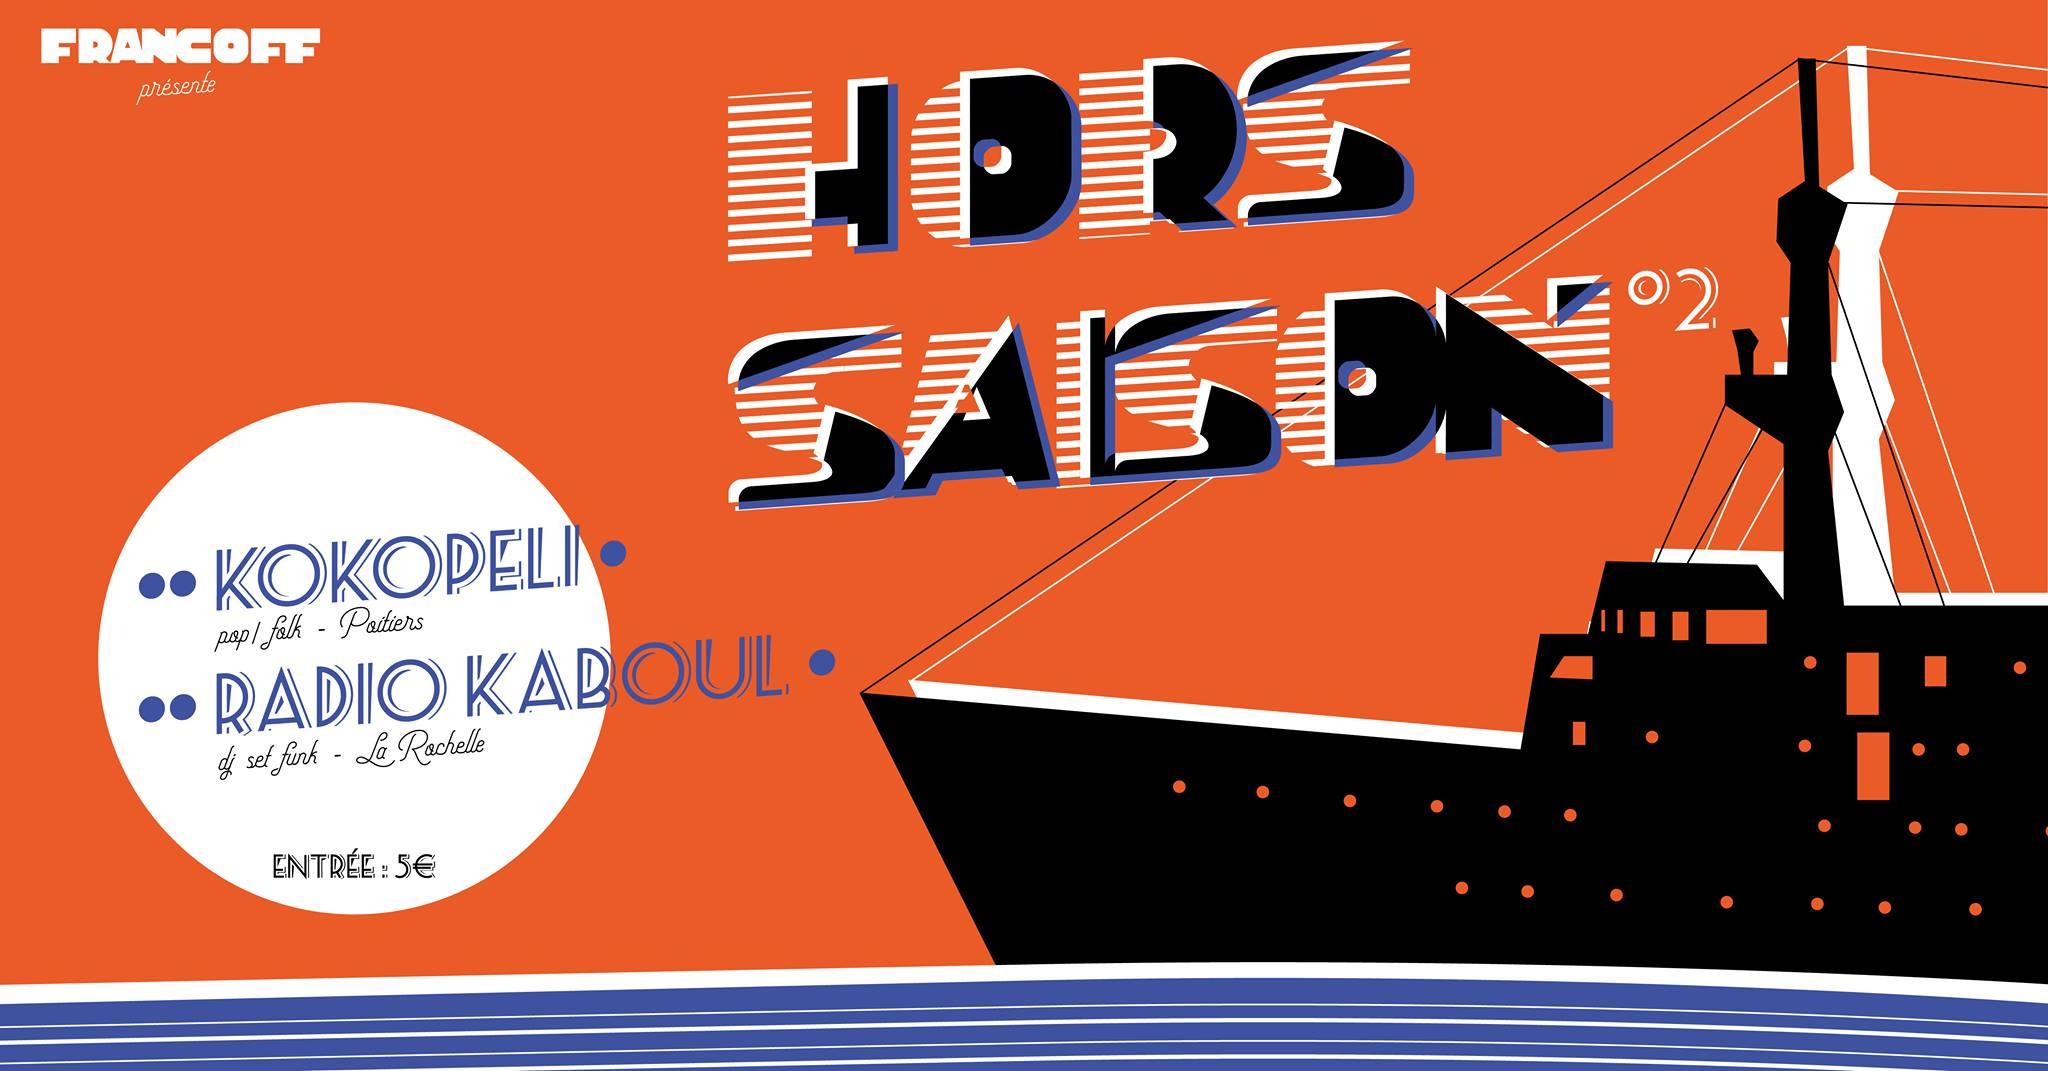 Samedi 15 juin 2019 à 18h : Hors Saison °2 // Kokopeli + Radio Kaboul